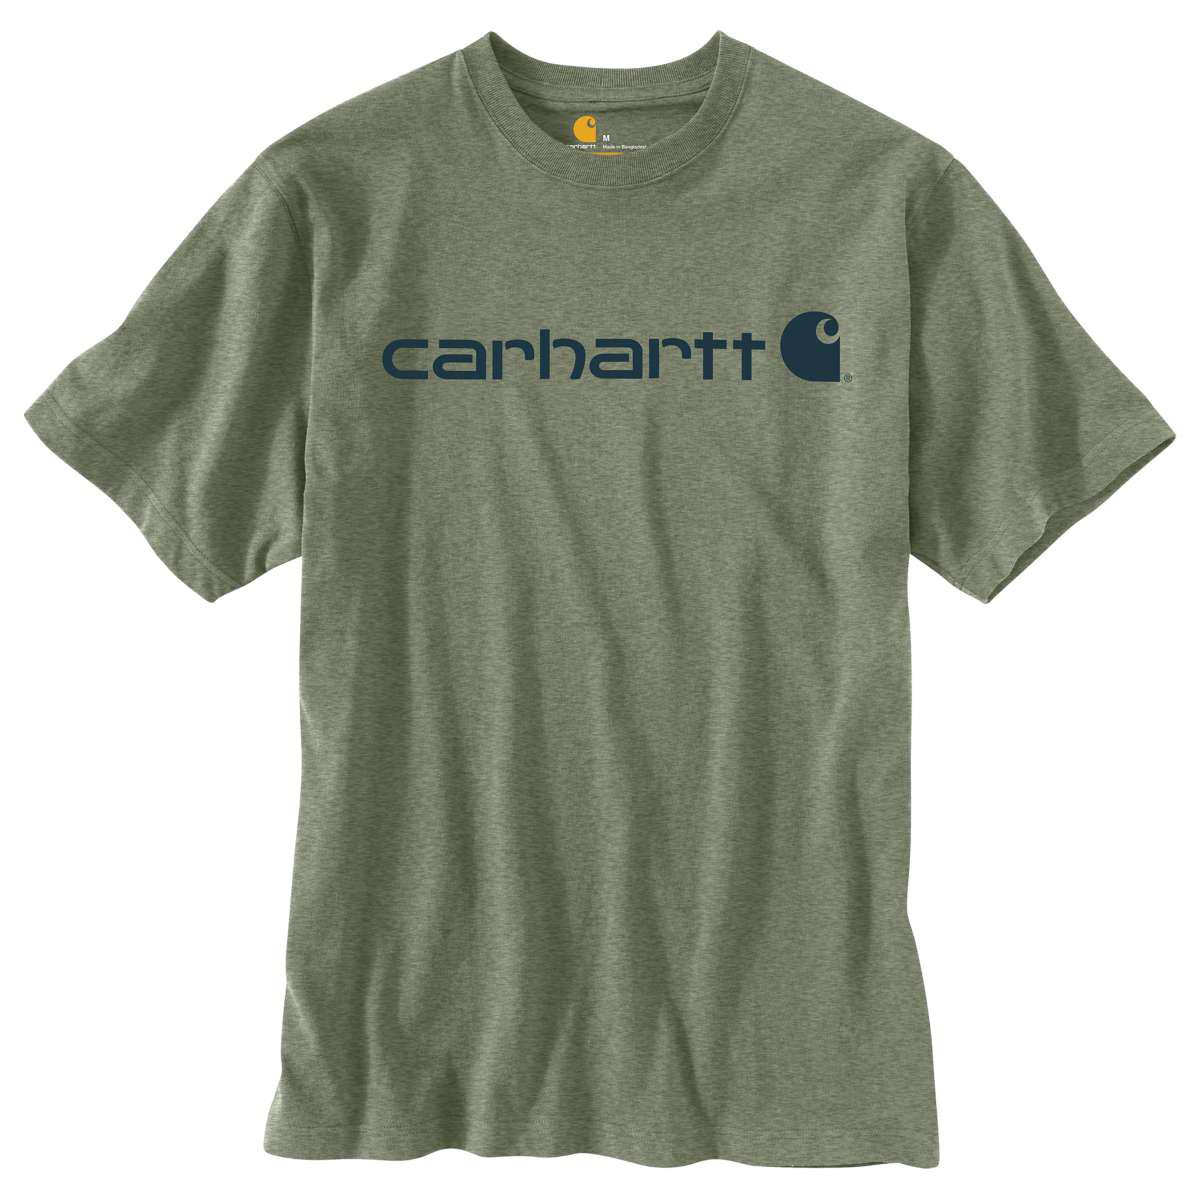 Carhartt Men's Short Sleeve Logo Tee - Green, M